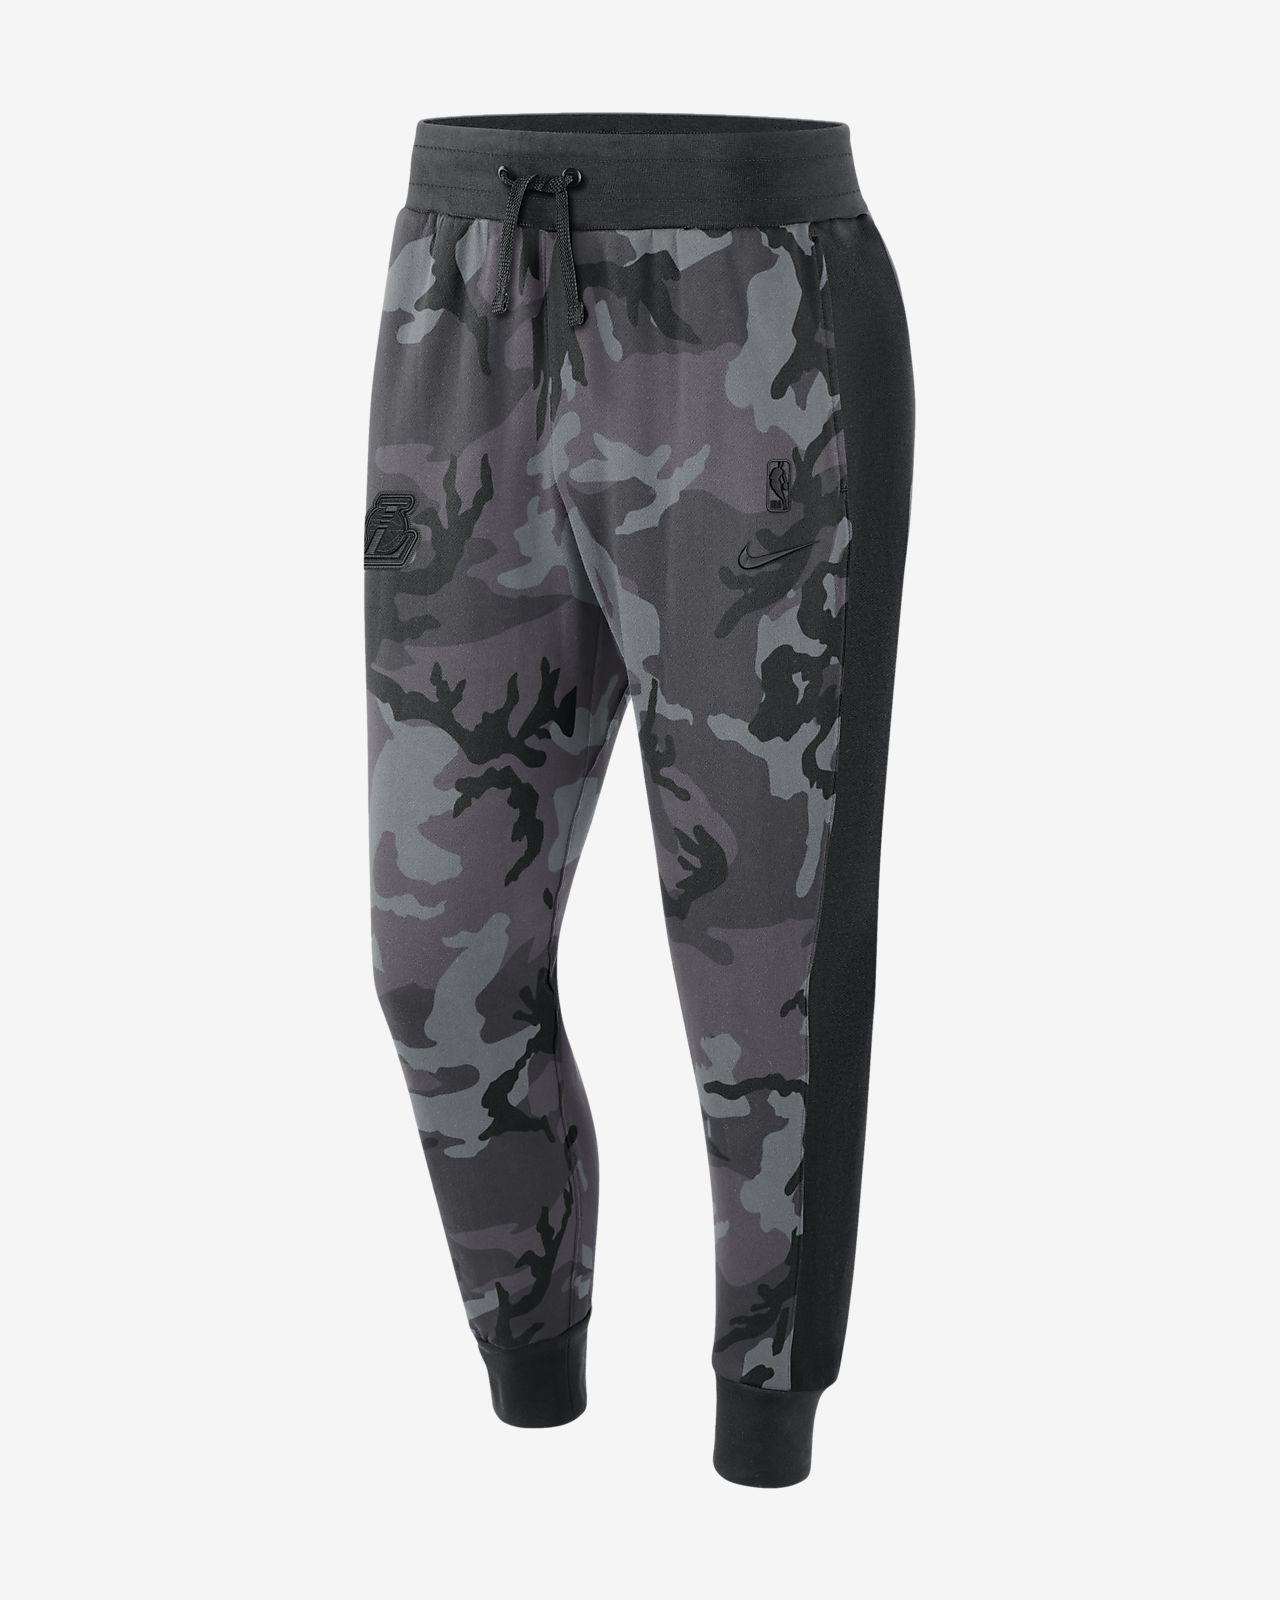 Pantalones de la NBA para hombre Los Angeles Lakers Nike